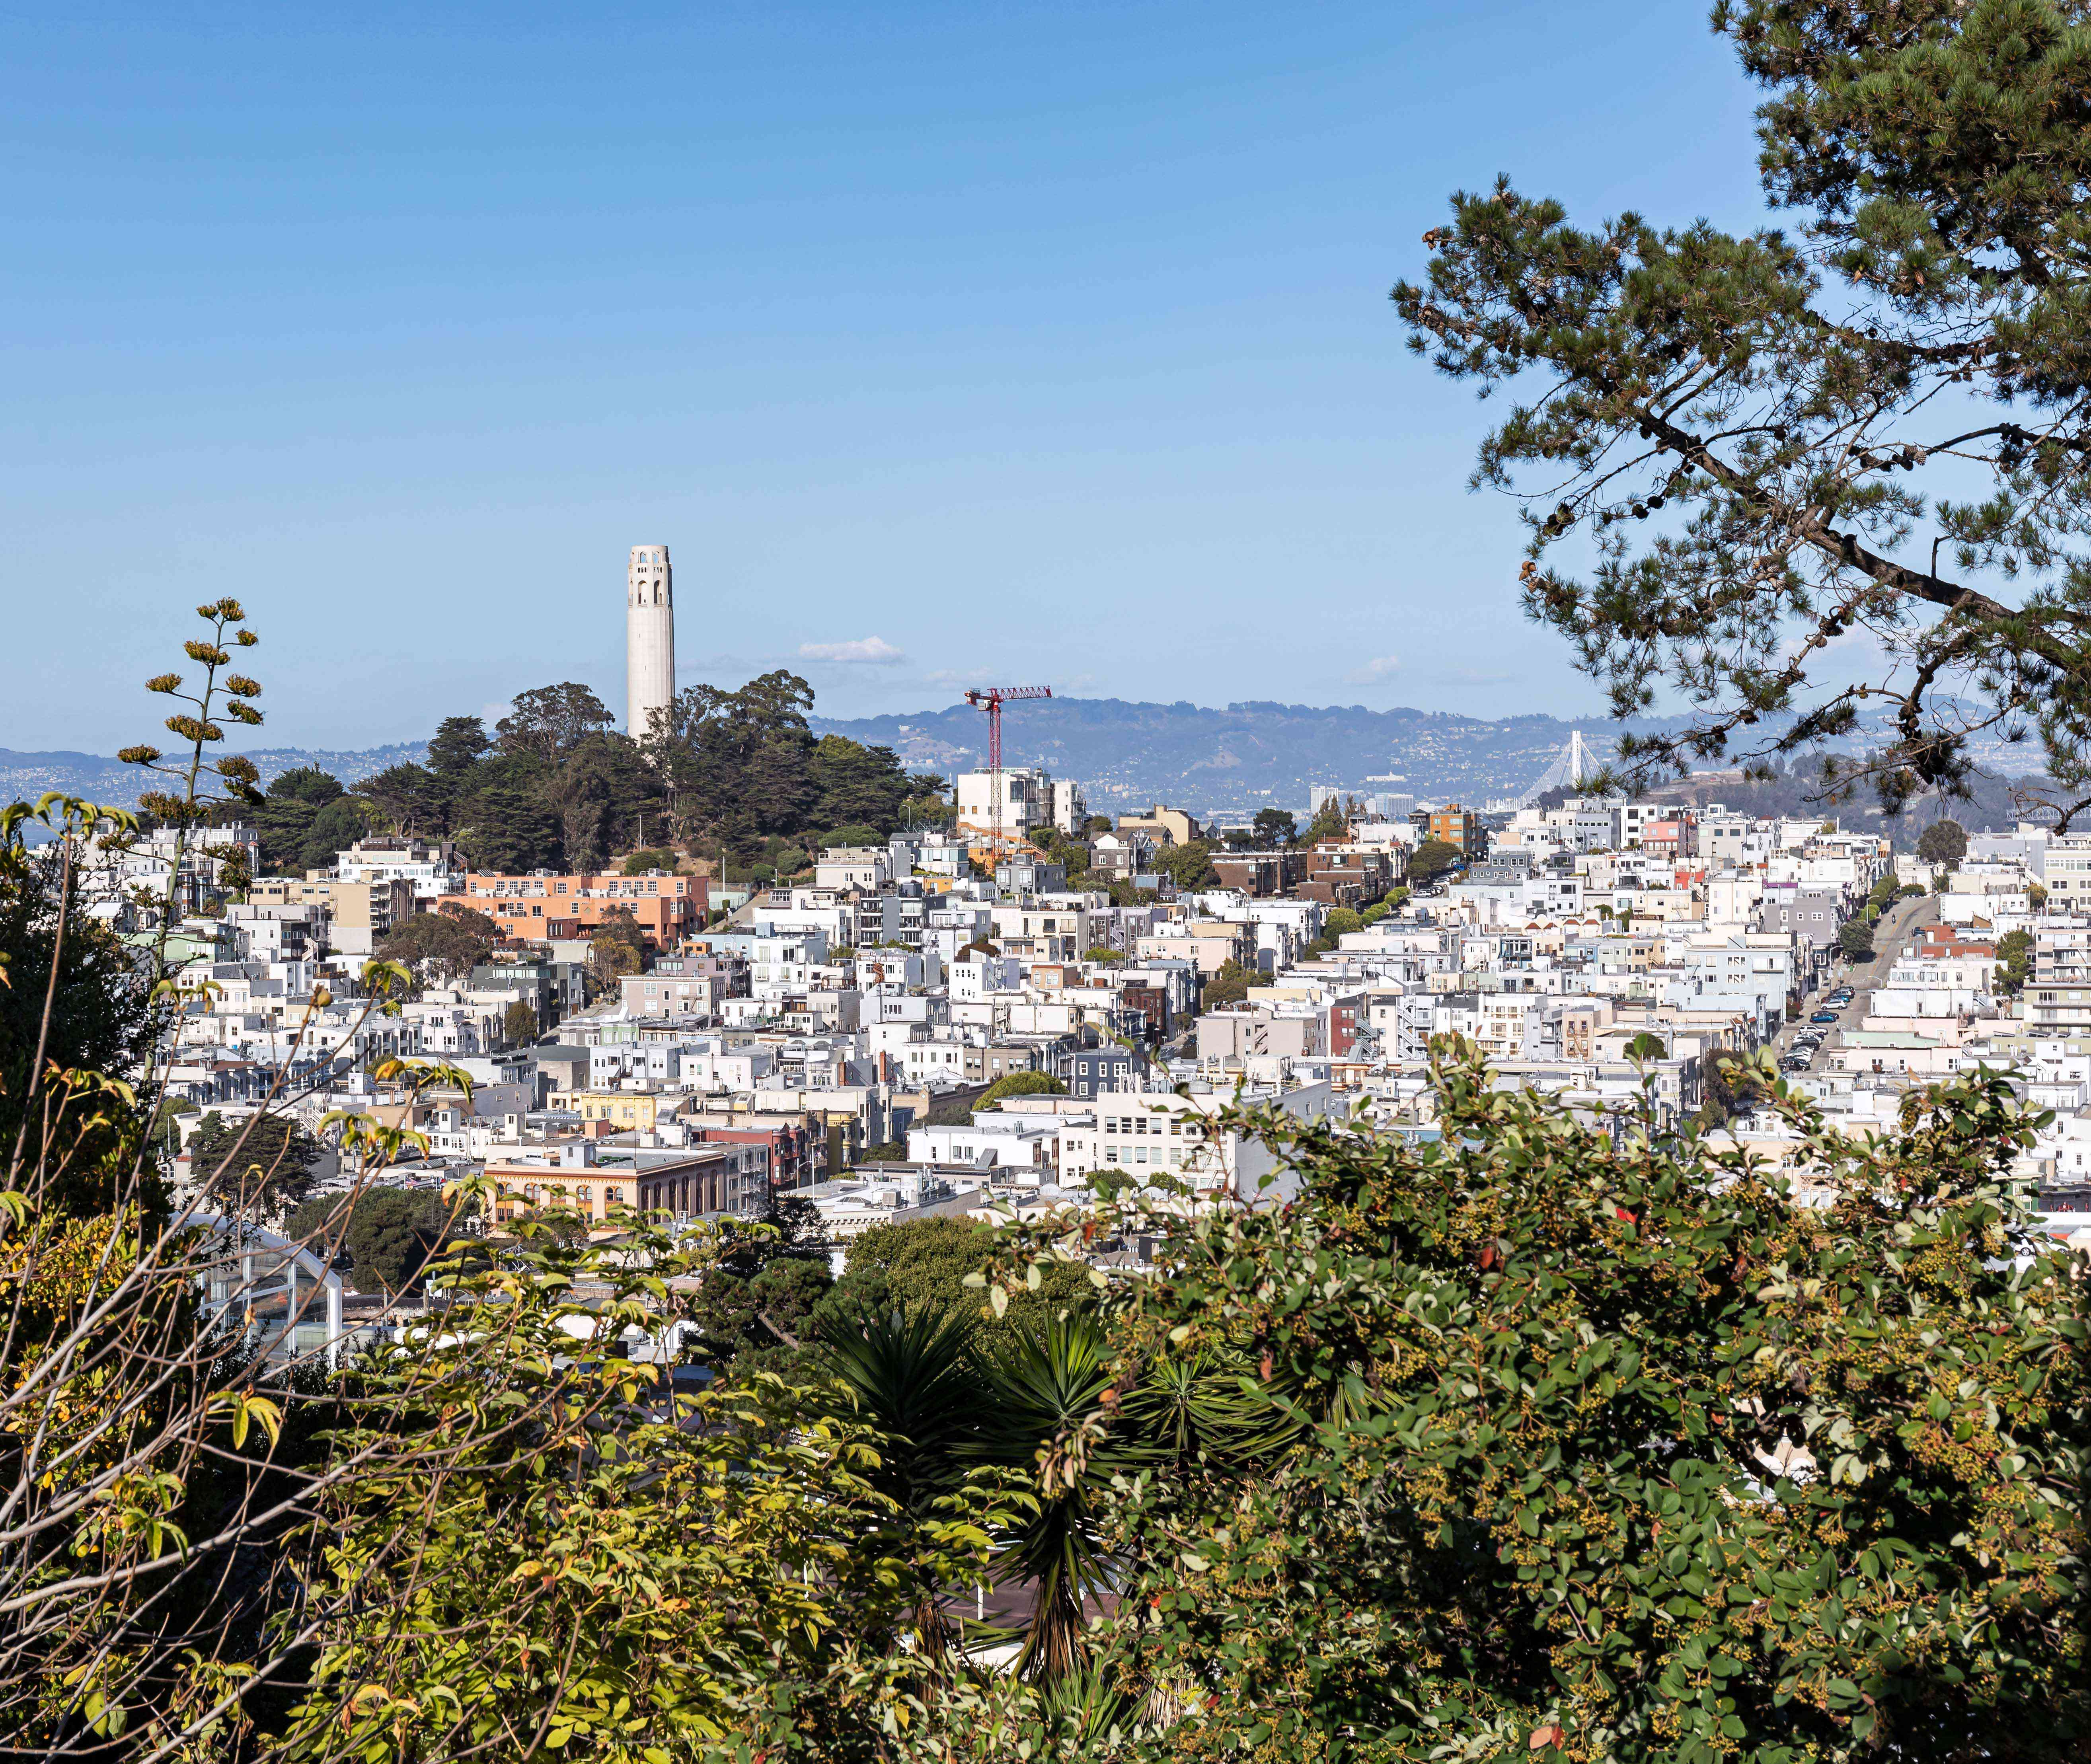 Telegraph Hill in San Francisco